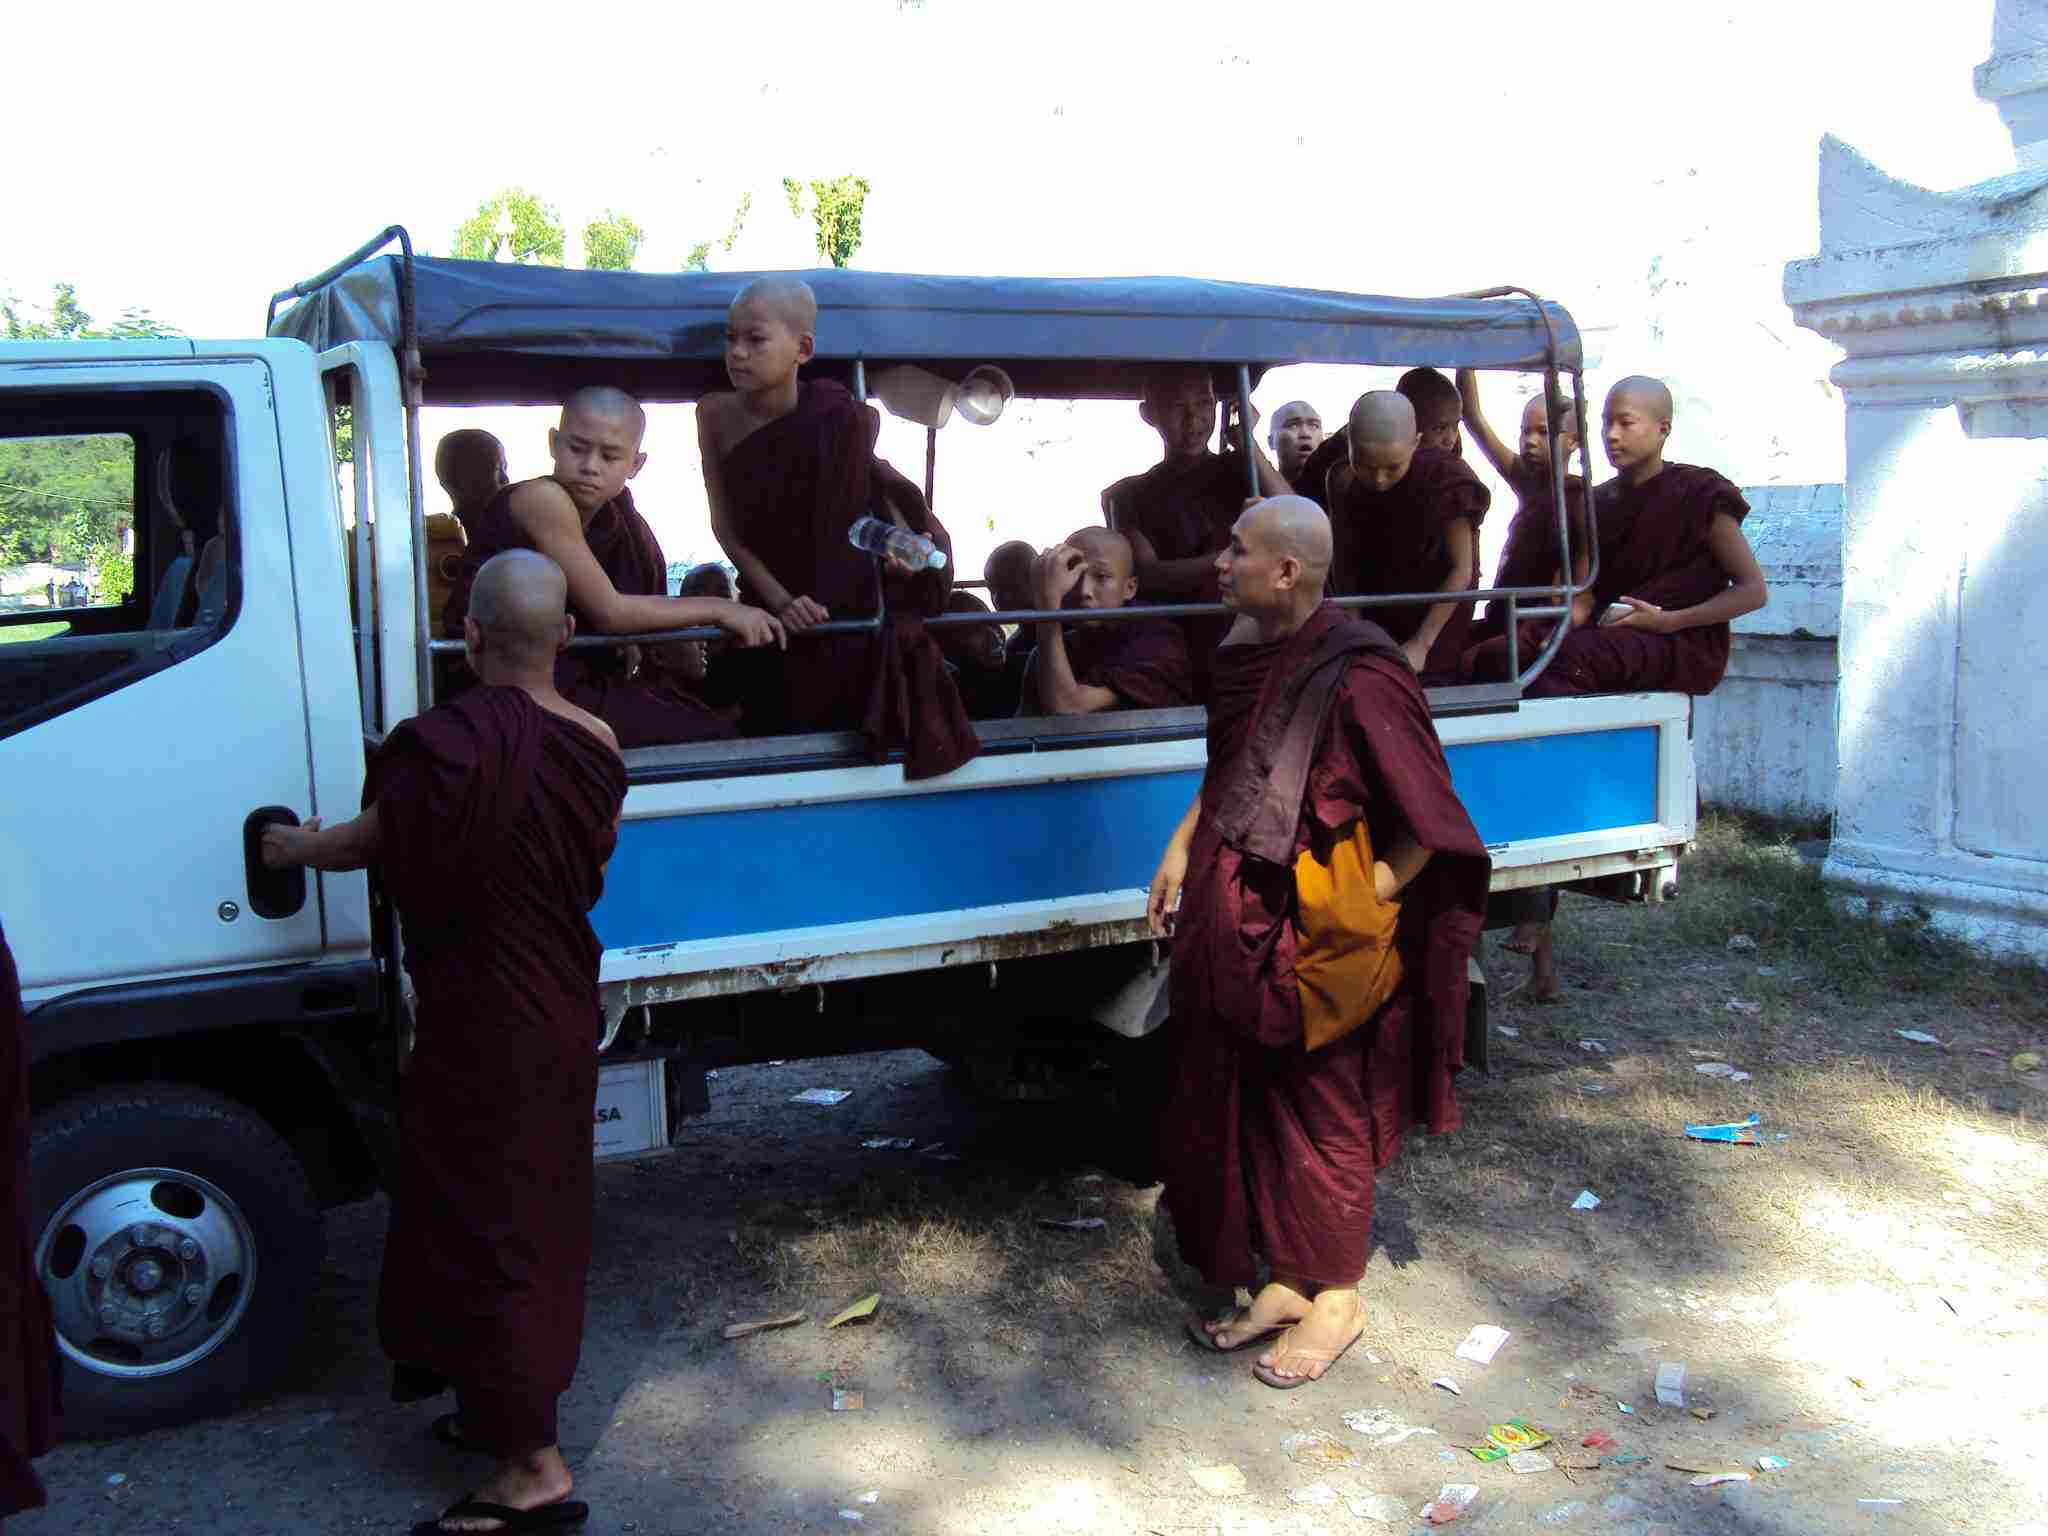 Monks and Samaneras